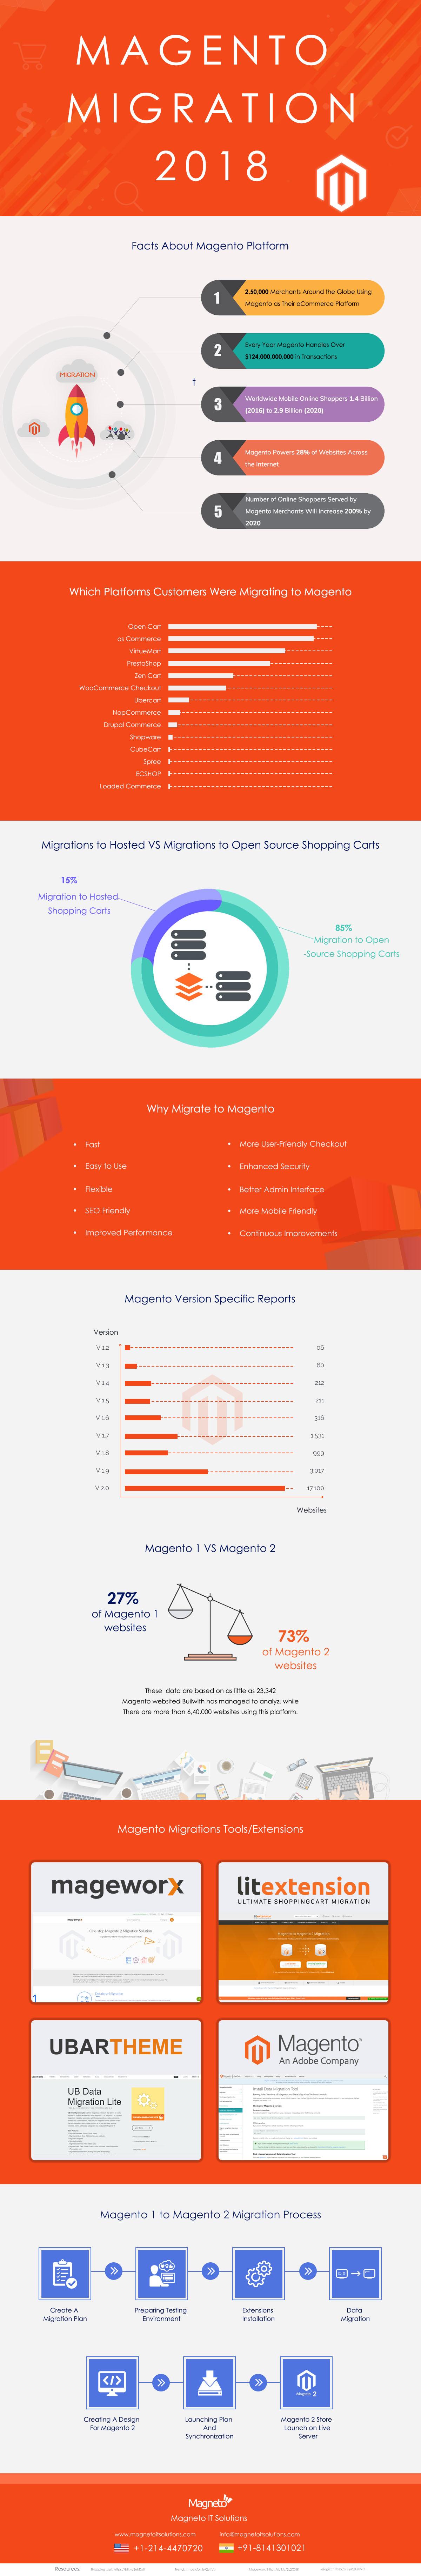 Magento Migration Infographic